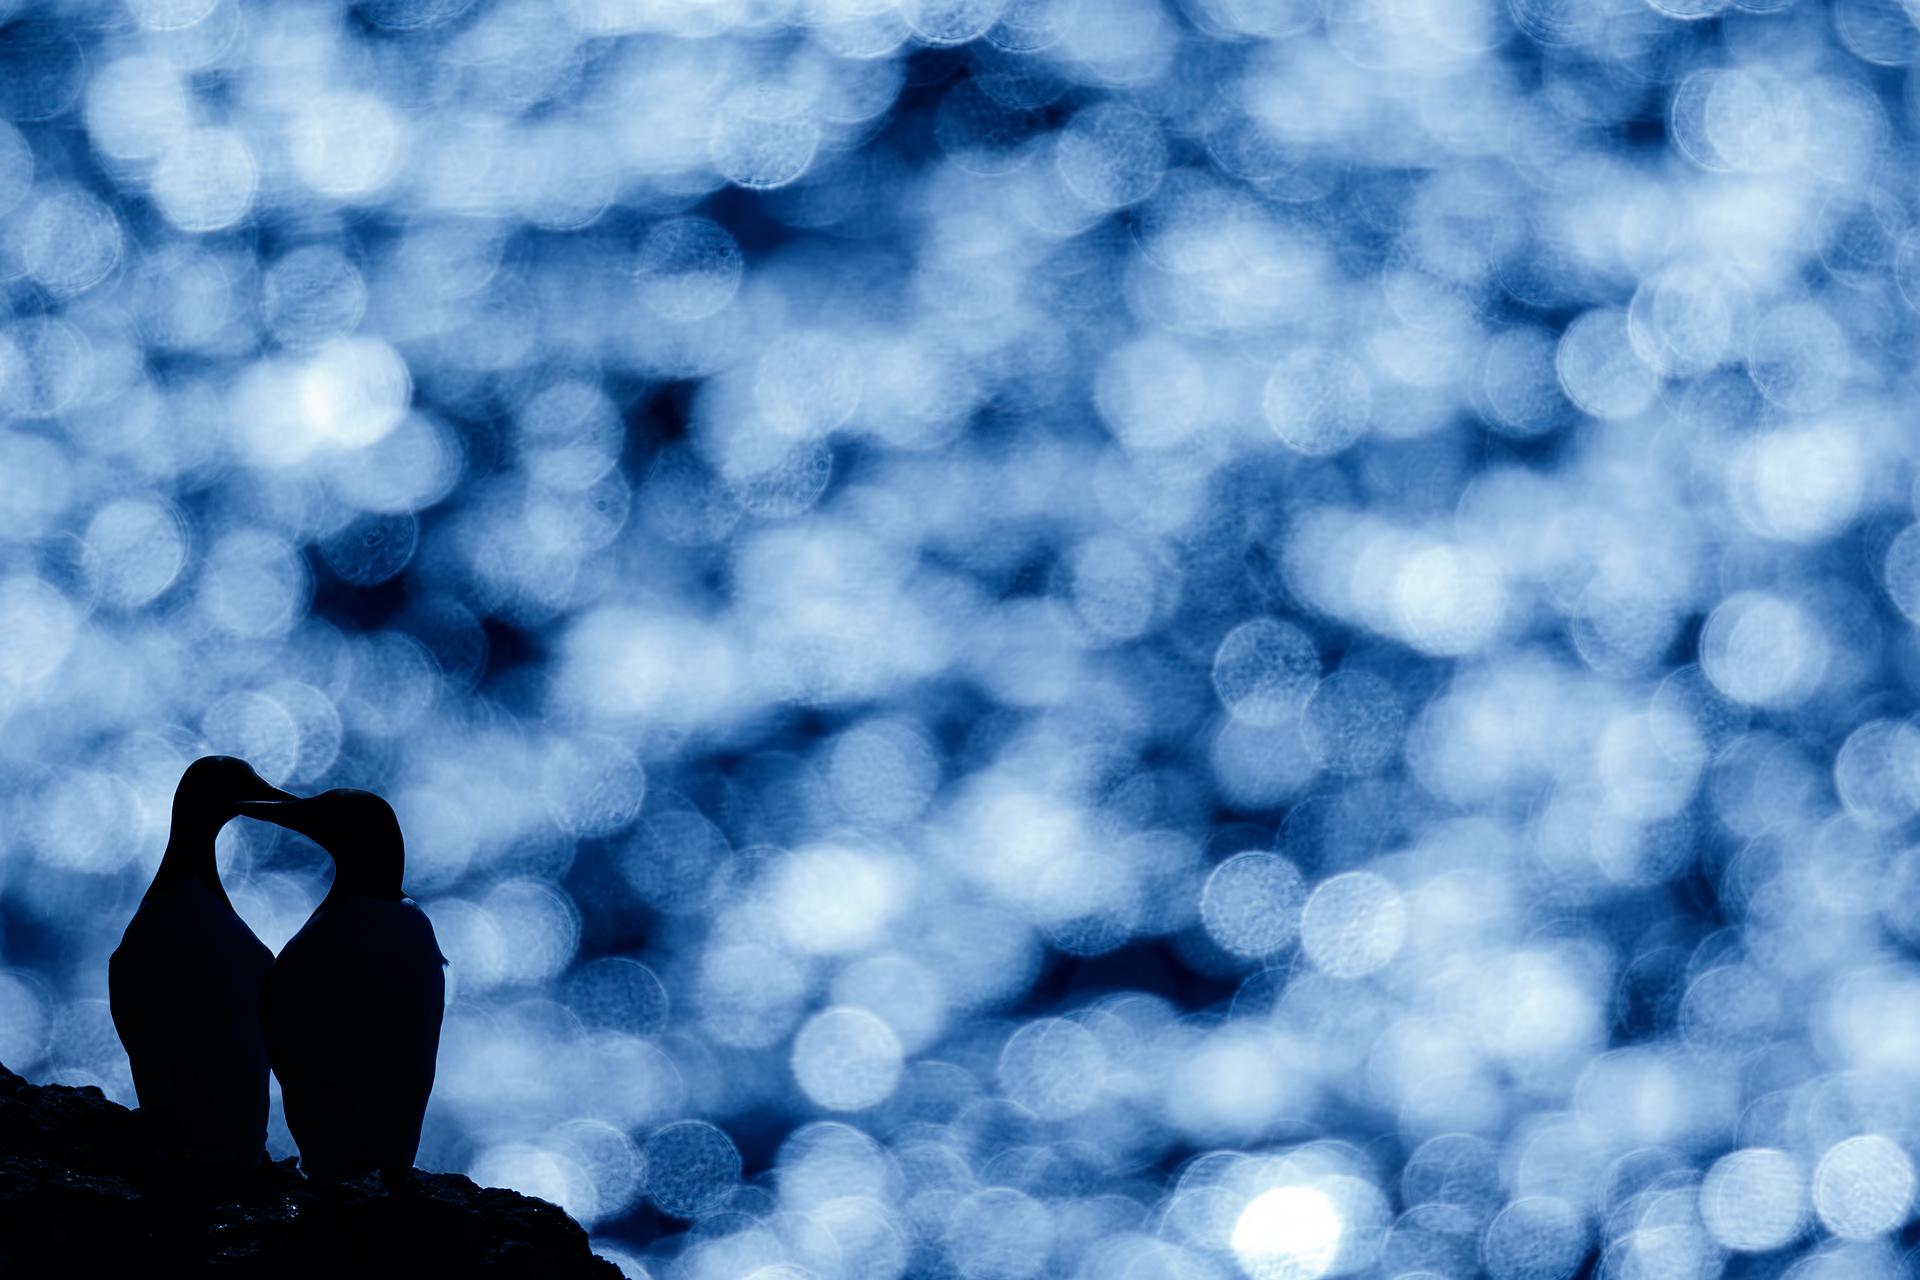 Cold heart - Mario Suarez - Portfolio Natural, Fotografía de Naturaleza de Autor